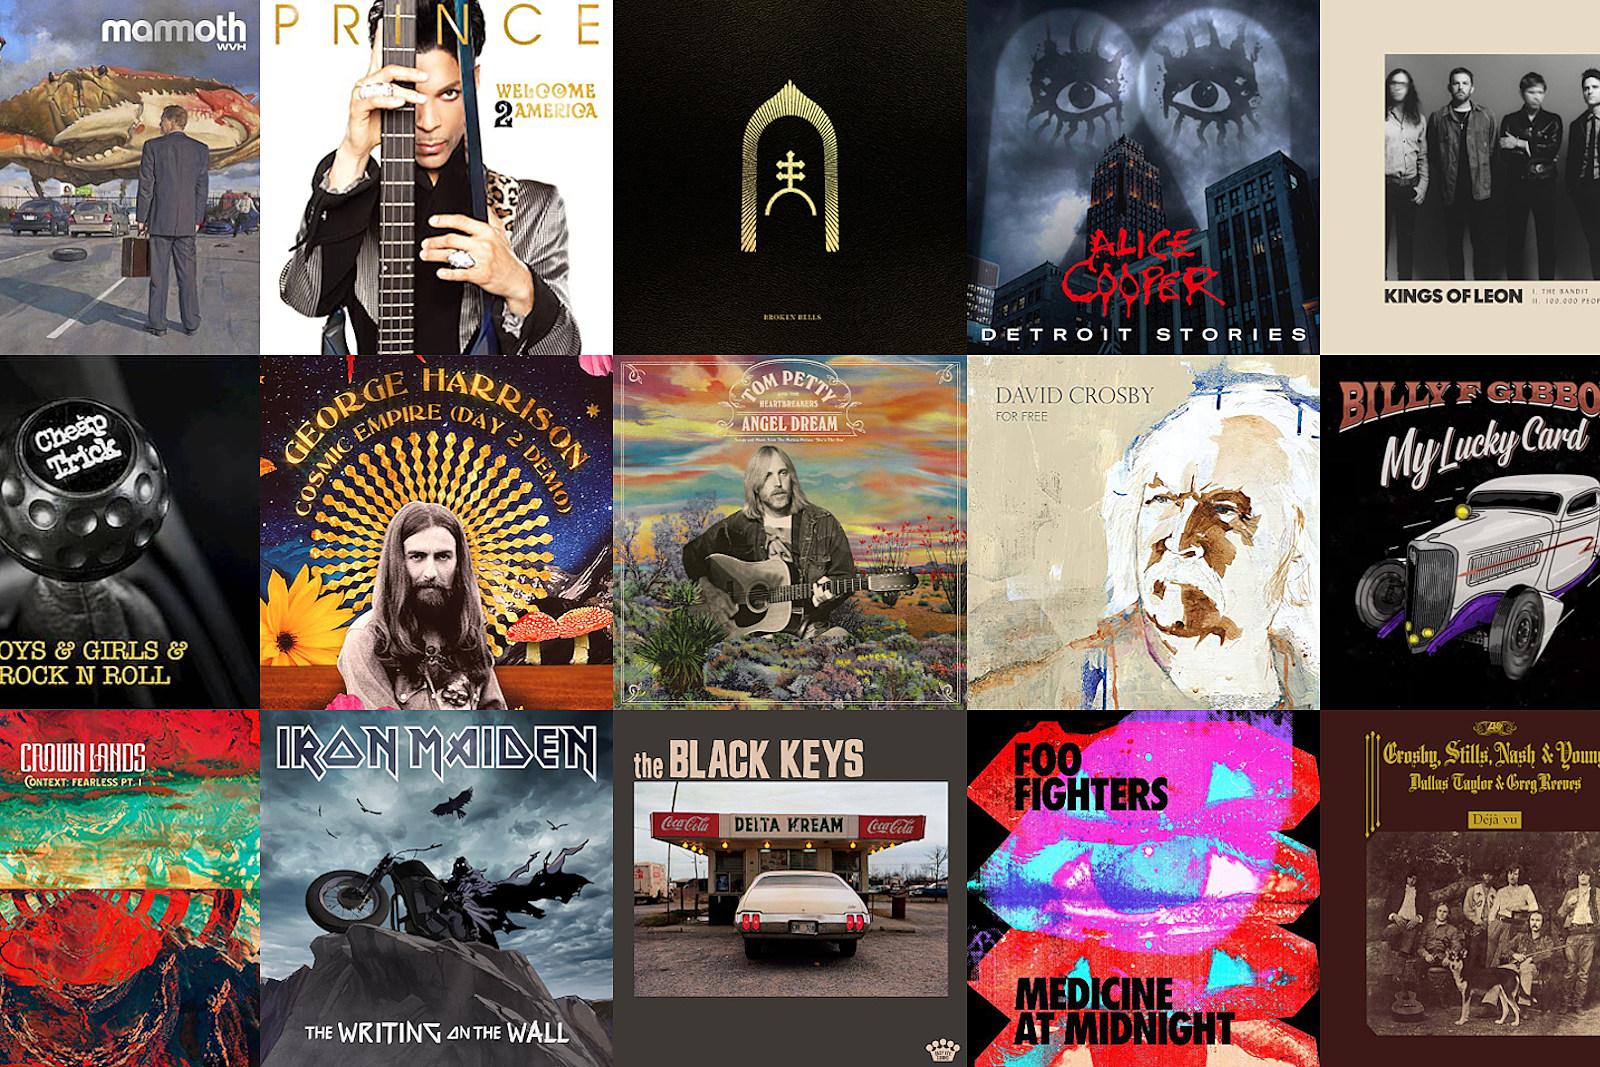 Top 20 Rock Songs of 2021 (So Far)